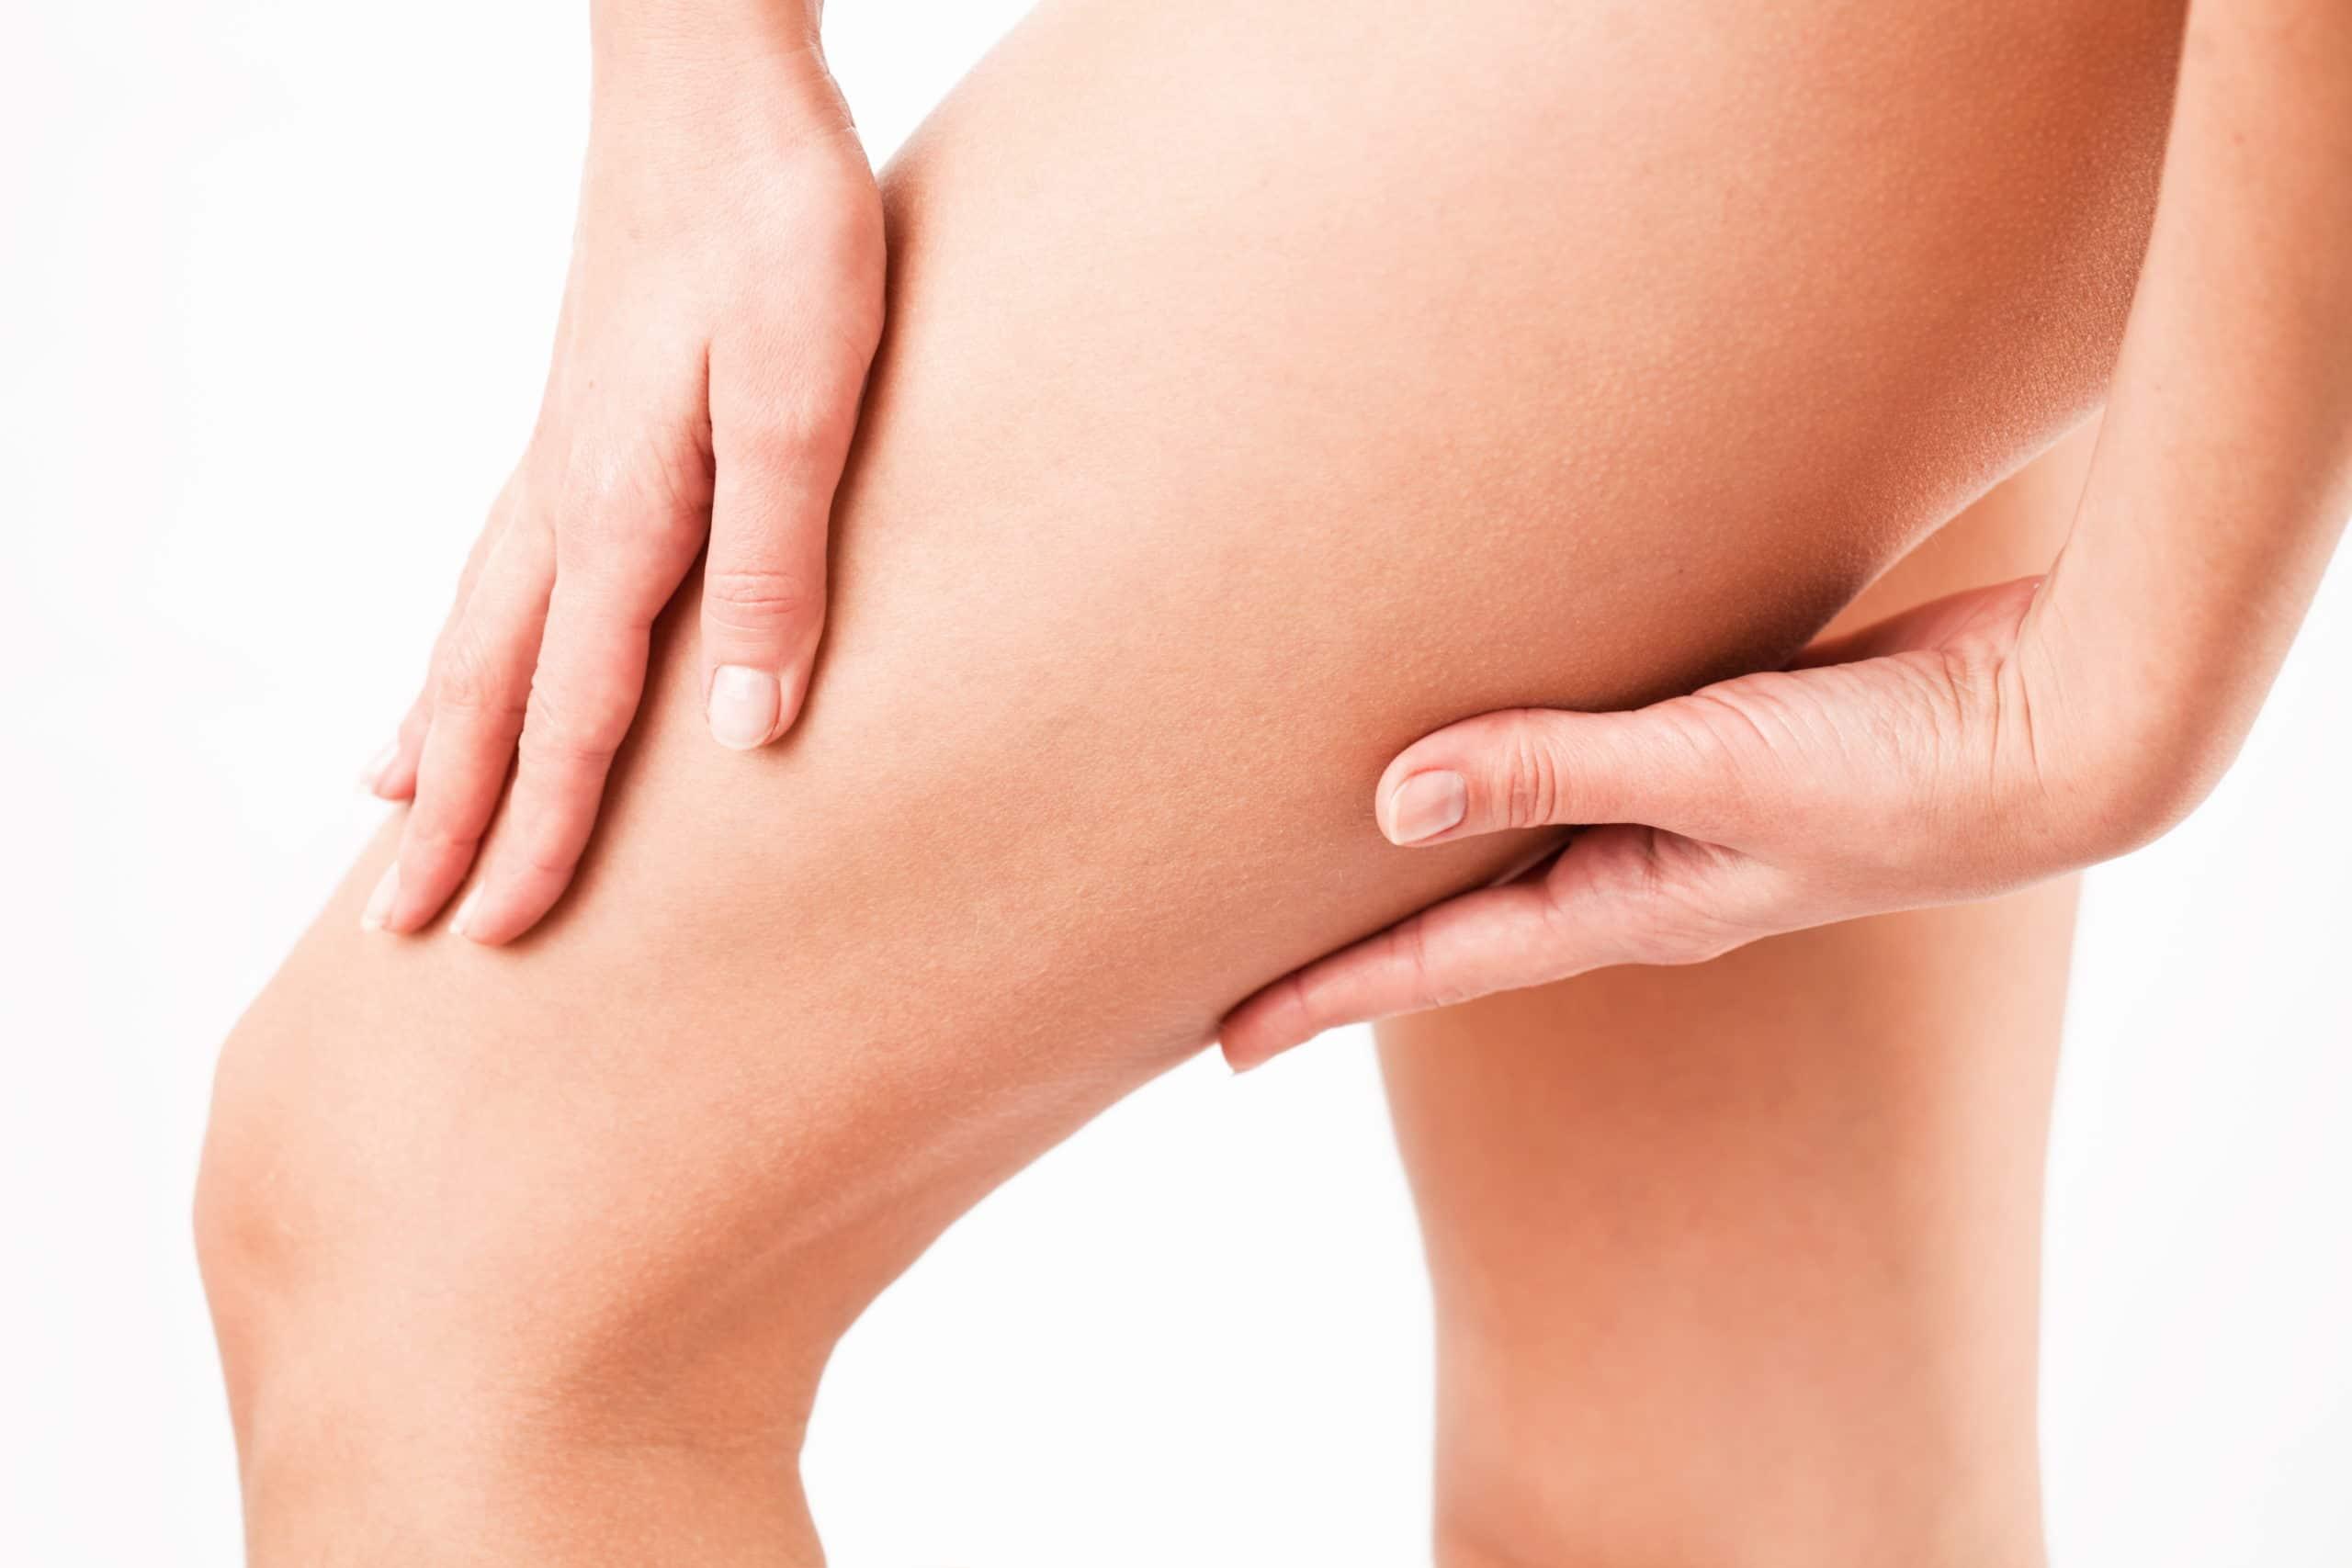 thigh lift surgery in toronto ontario